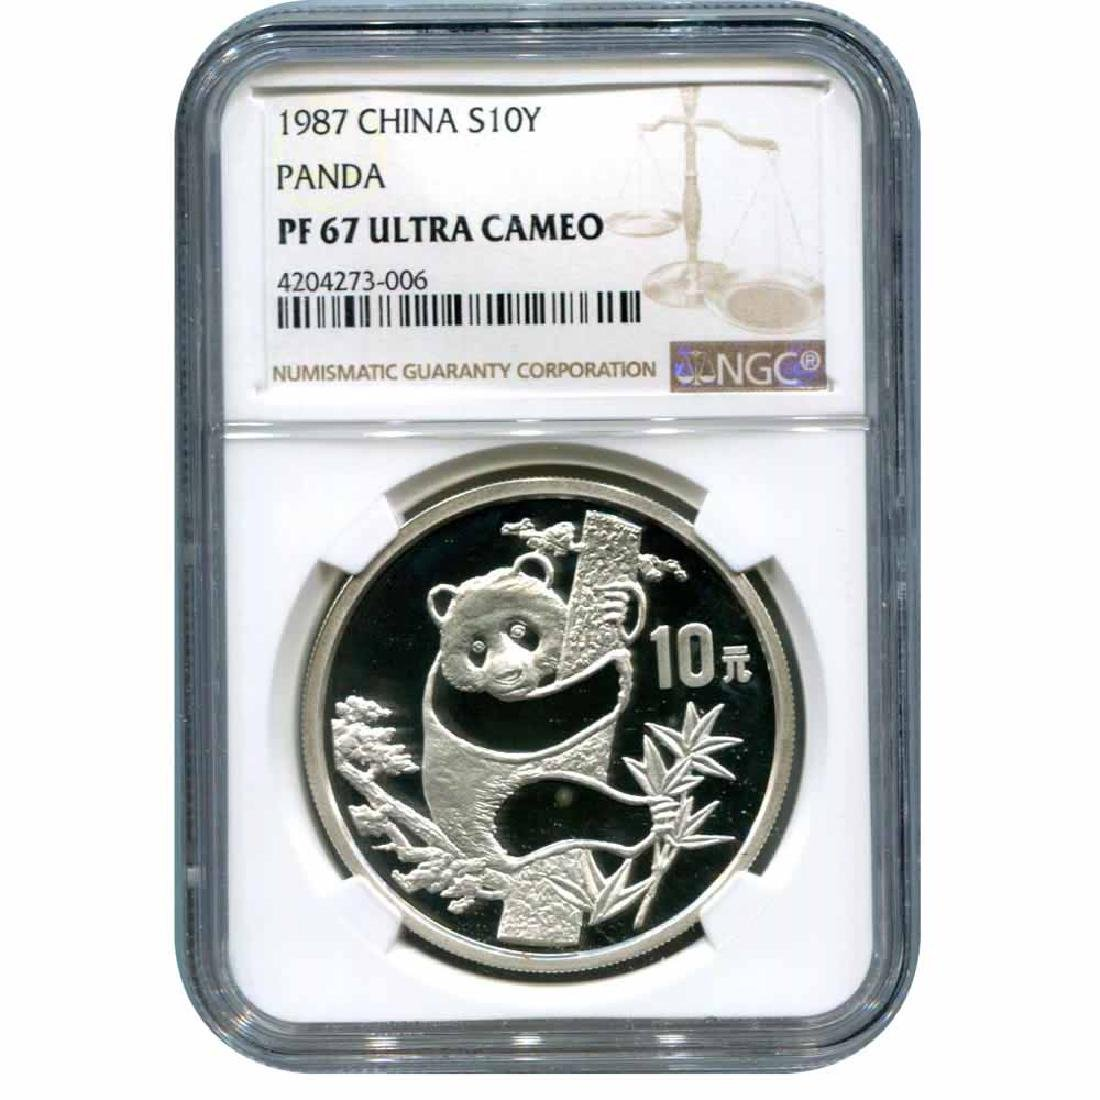 Certified Chinese Panda One Ounce 1987 PF67 NGC